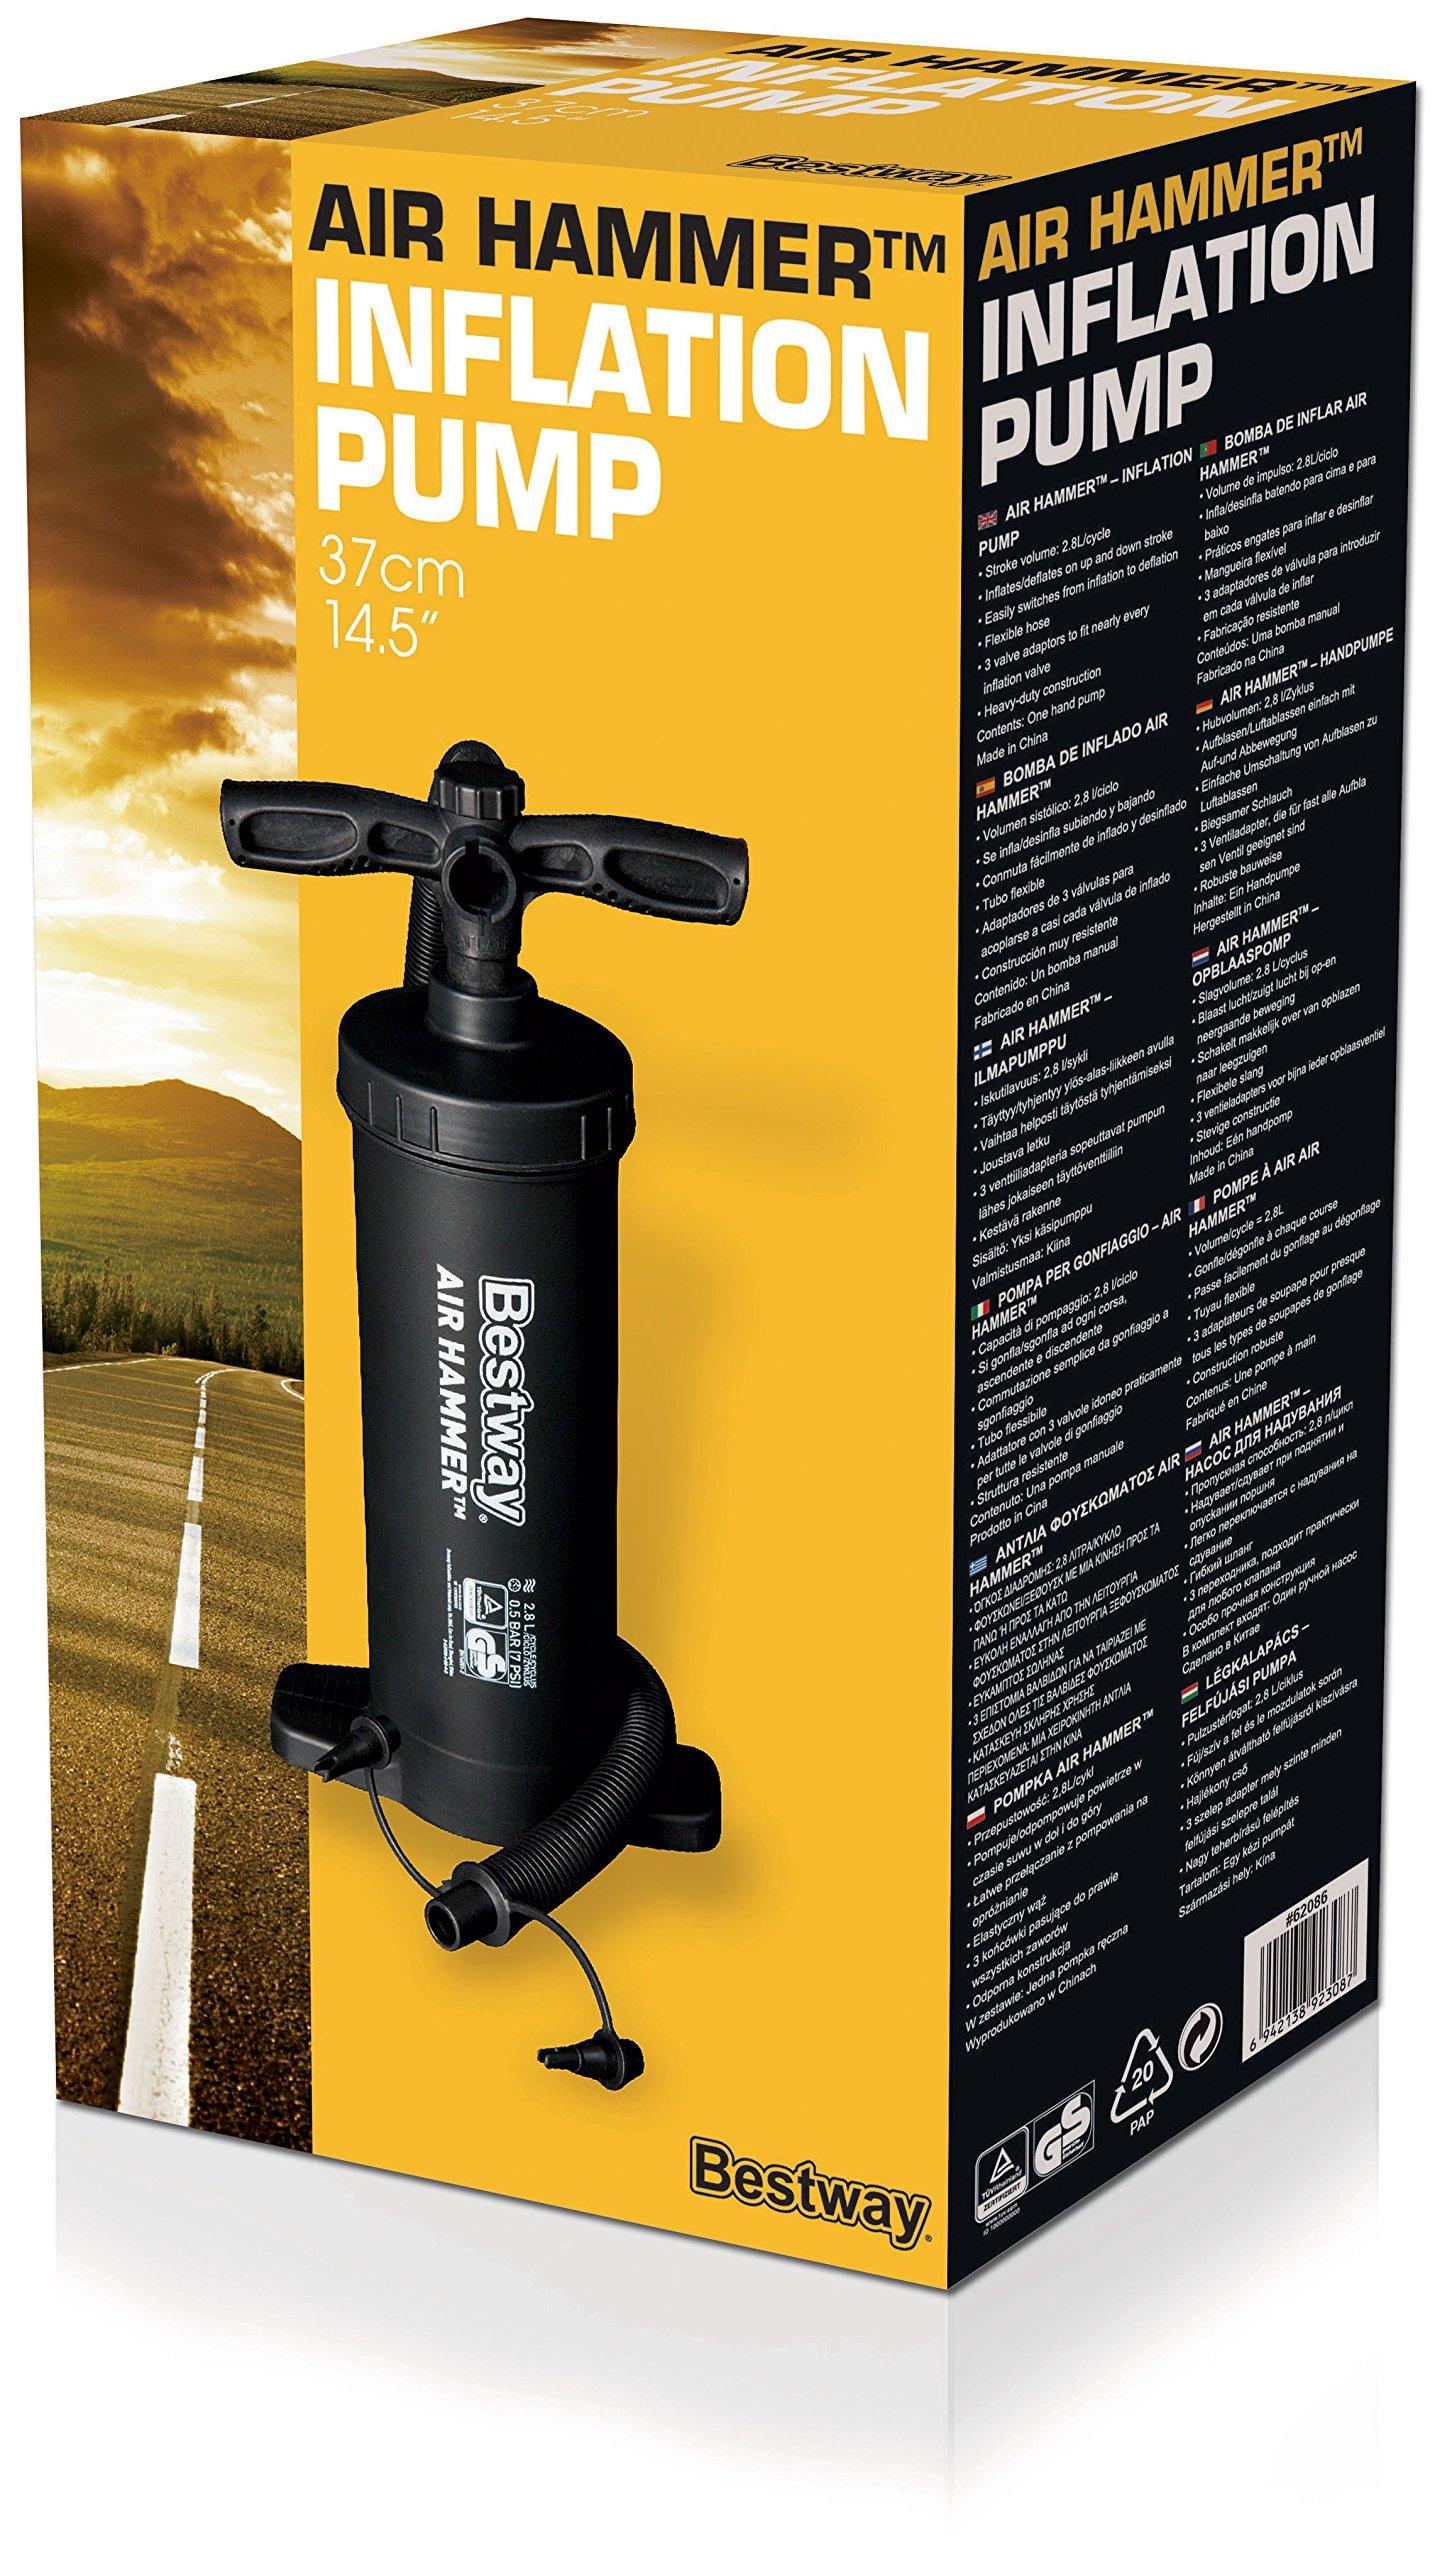 Bestway Air Hammer Inflation Pump 3